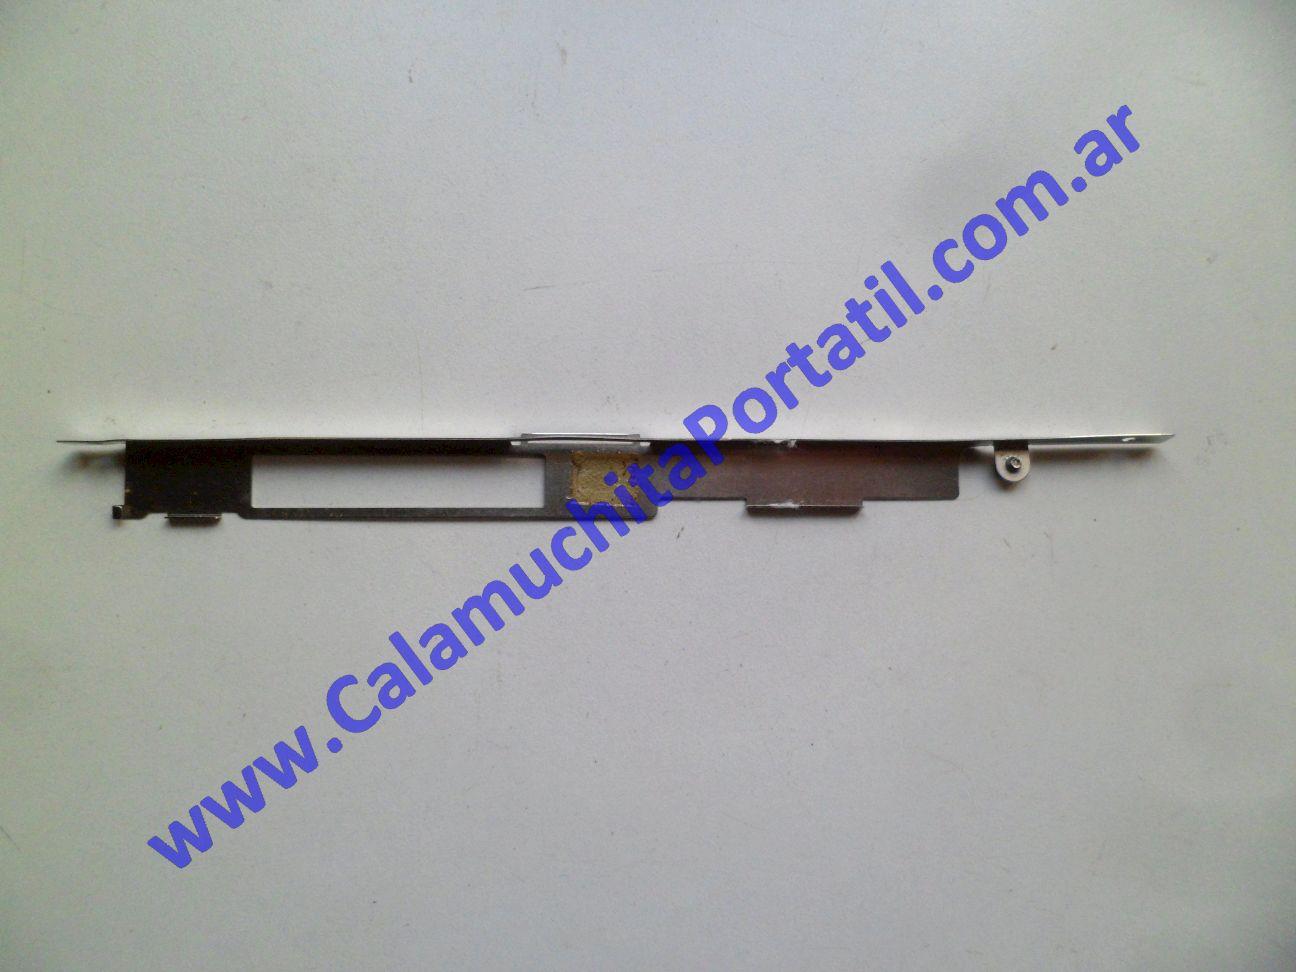 0332INX Inverter Accesorios Dell Inspiron 6400 / PP20L